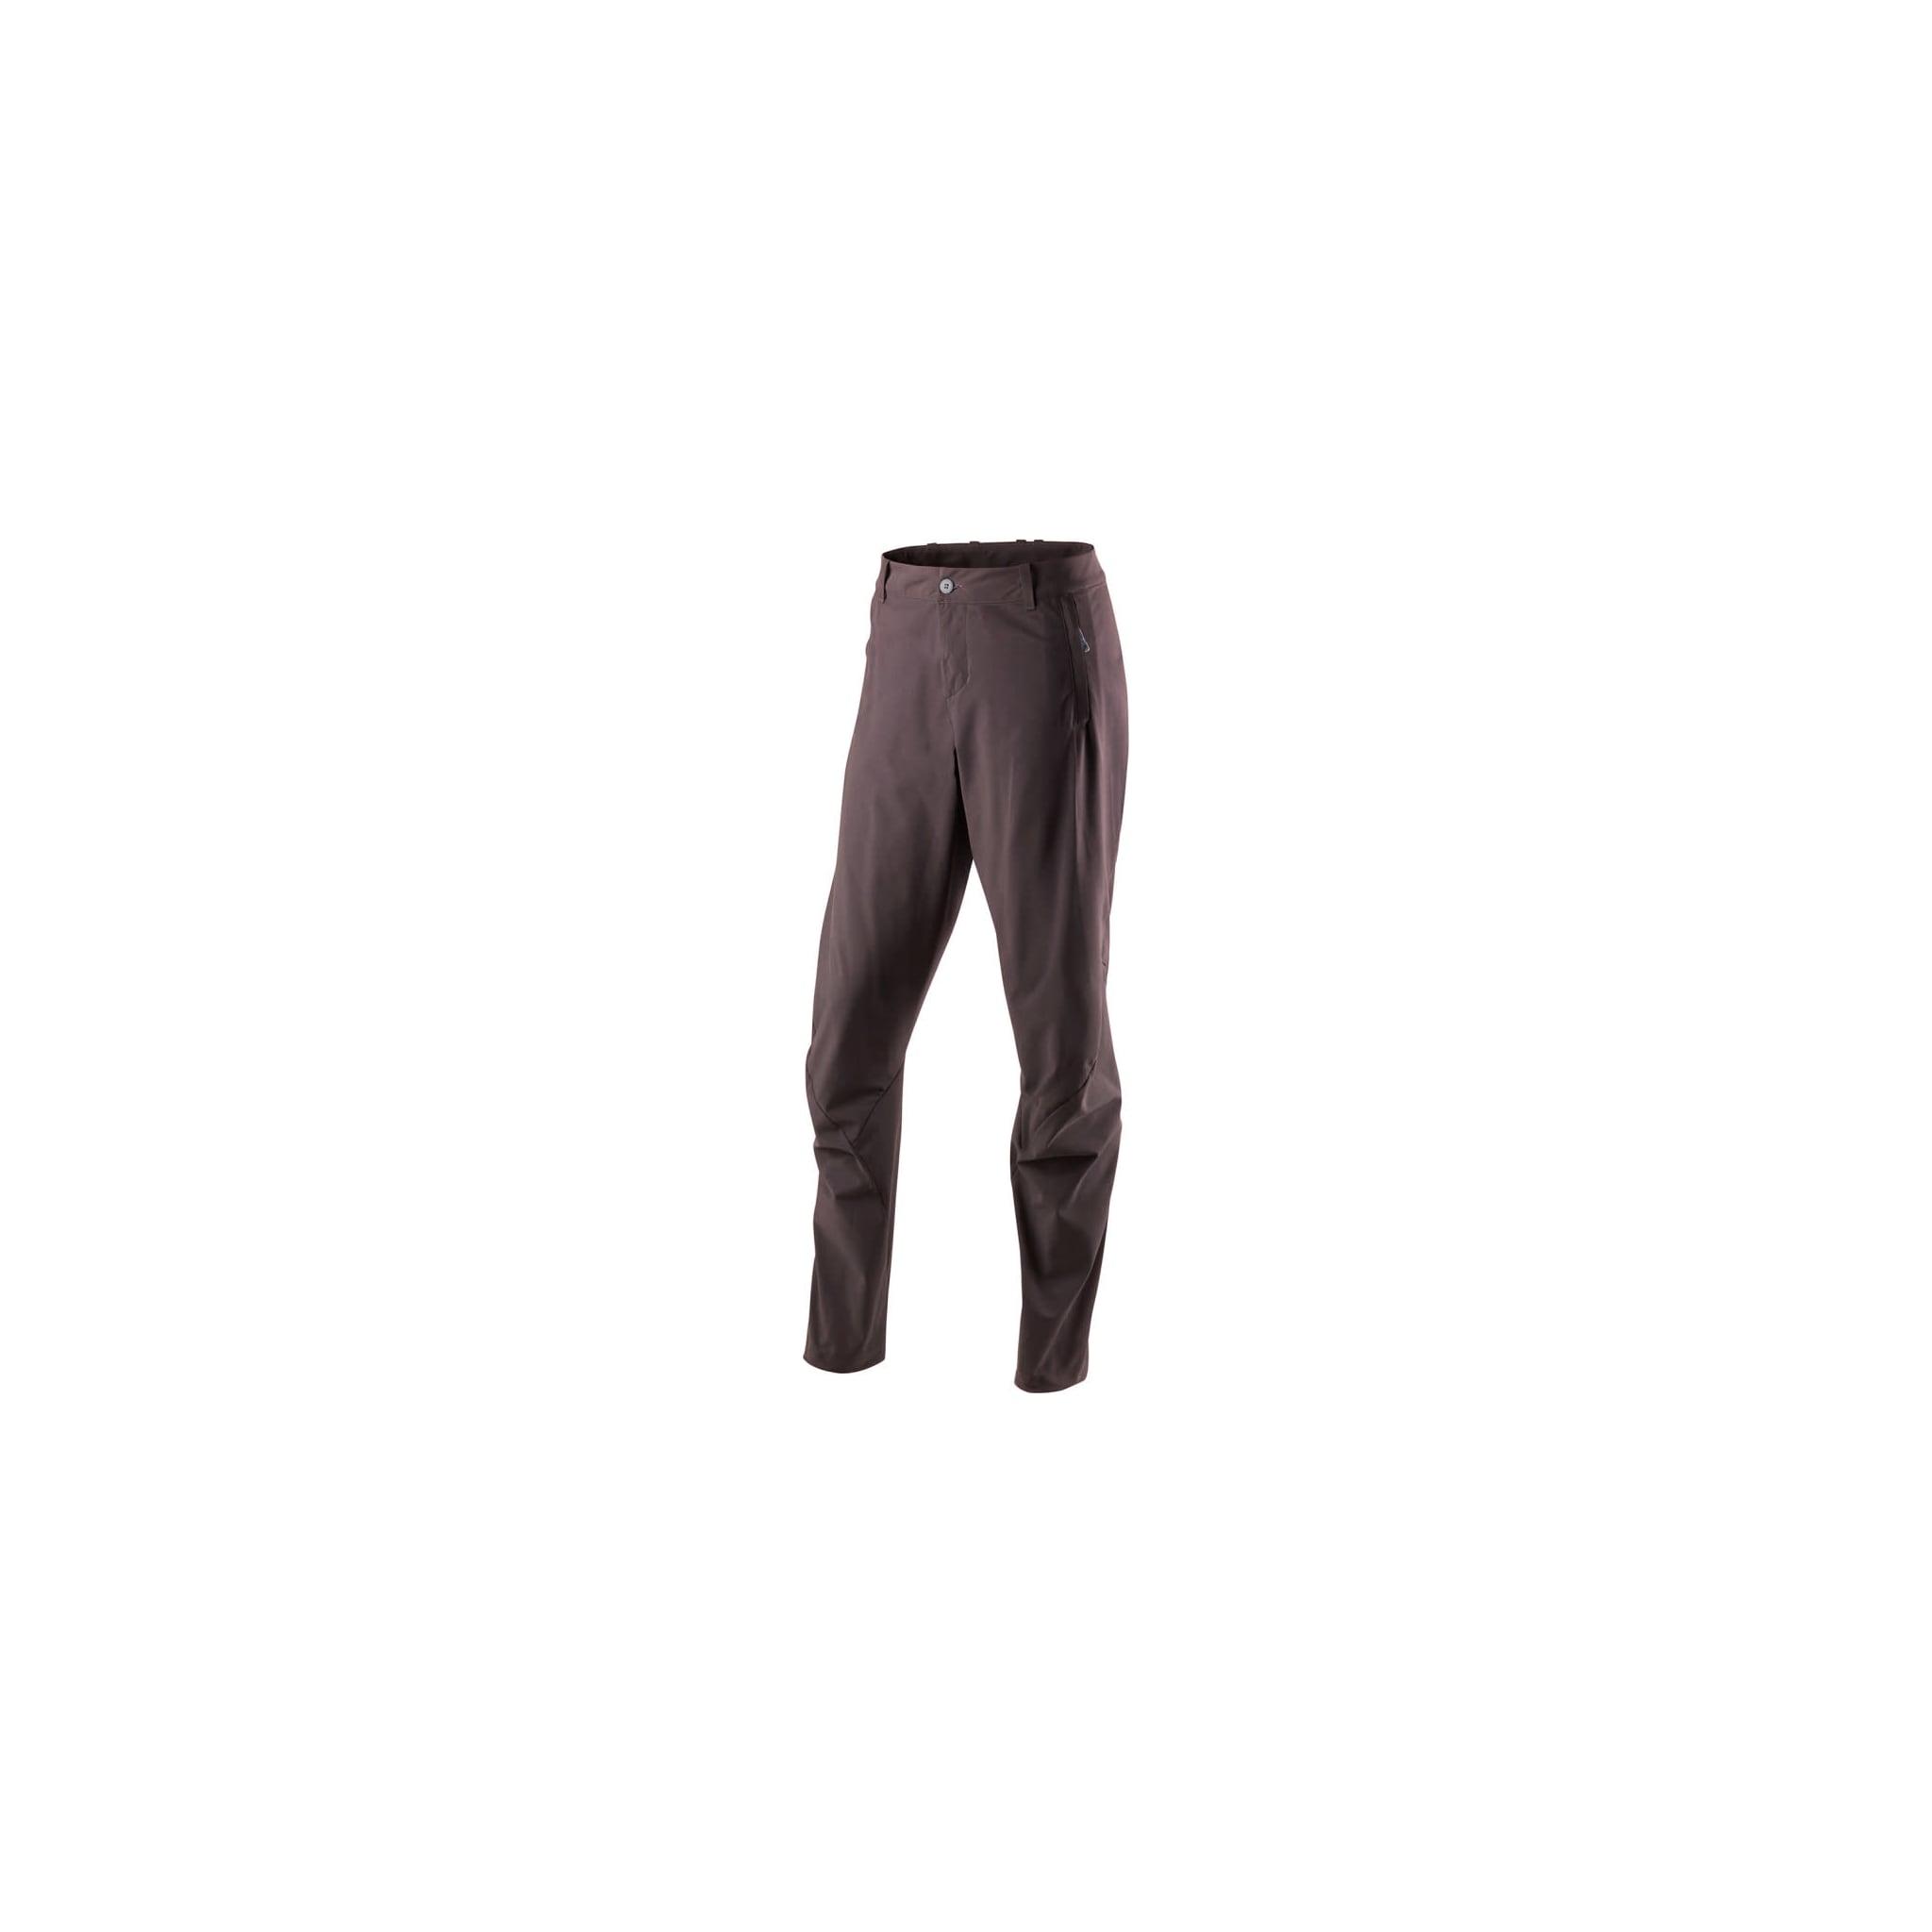 Kule, hurtigtørkende og superkomfortable bukser